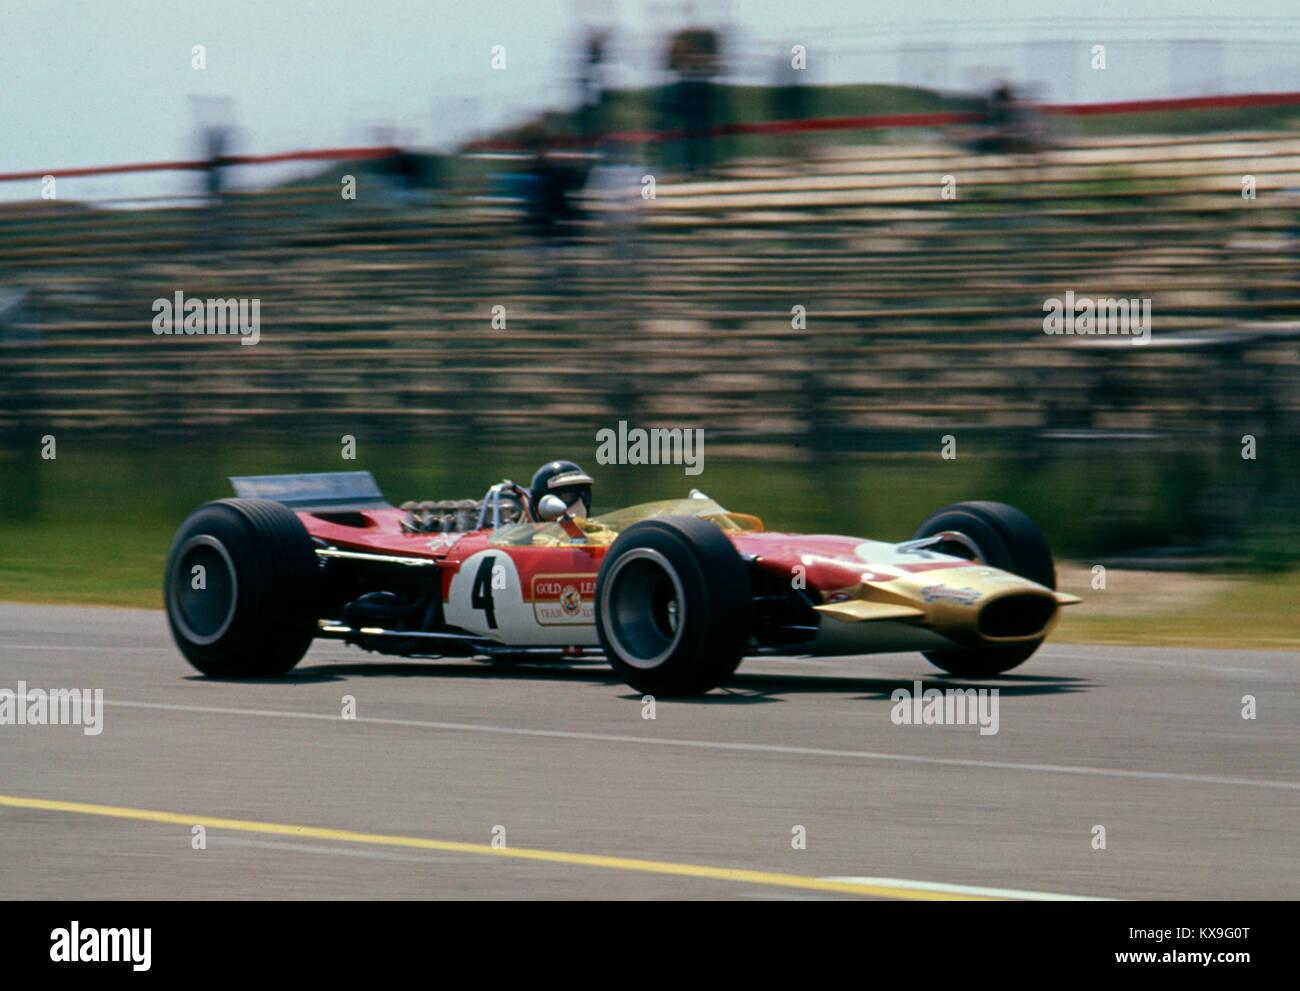 Dutch Grand Prix Stock Photos & Dutch Grand Prix Stock Images - Alamy